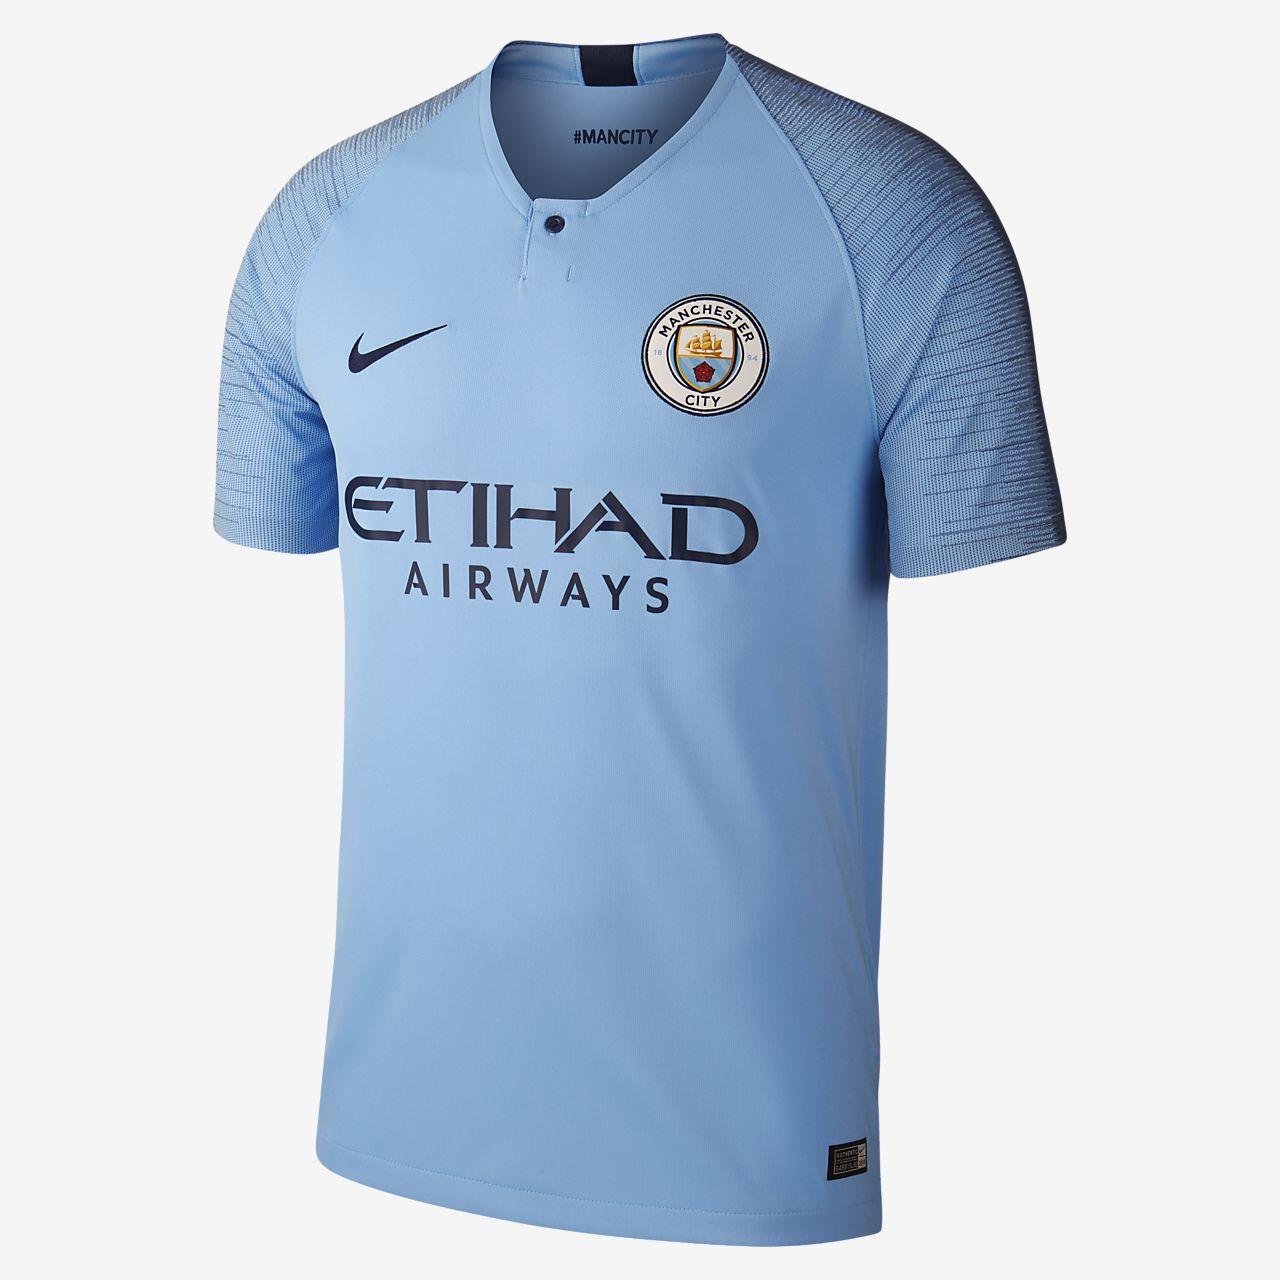 5abd5bc6d78 2018 19 Manchester City FC Stadium Home Men s Football Shirt. Nike ...